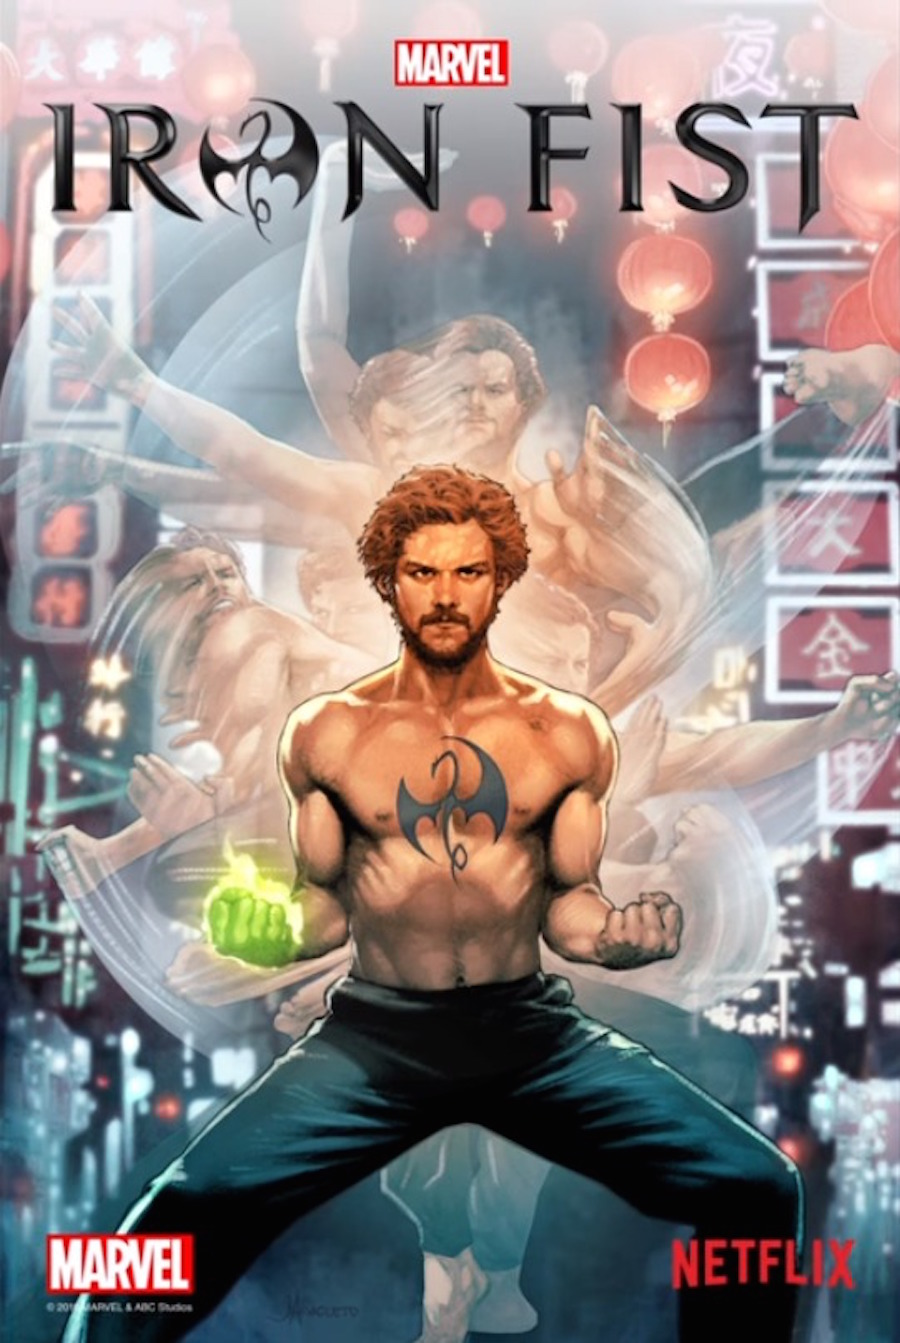 Iron Fist - Portada